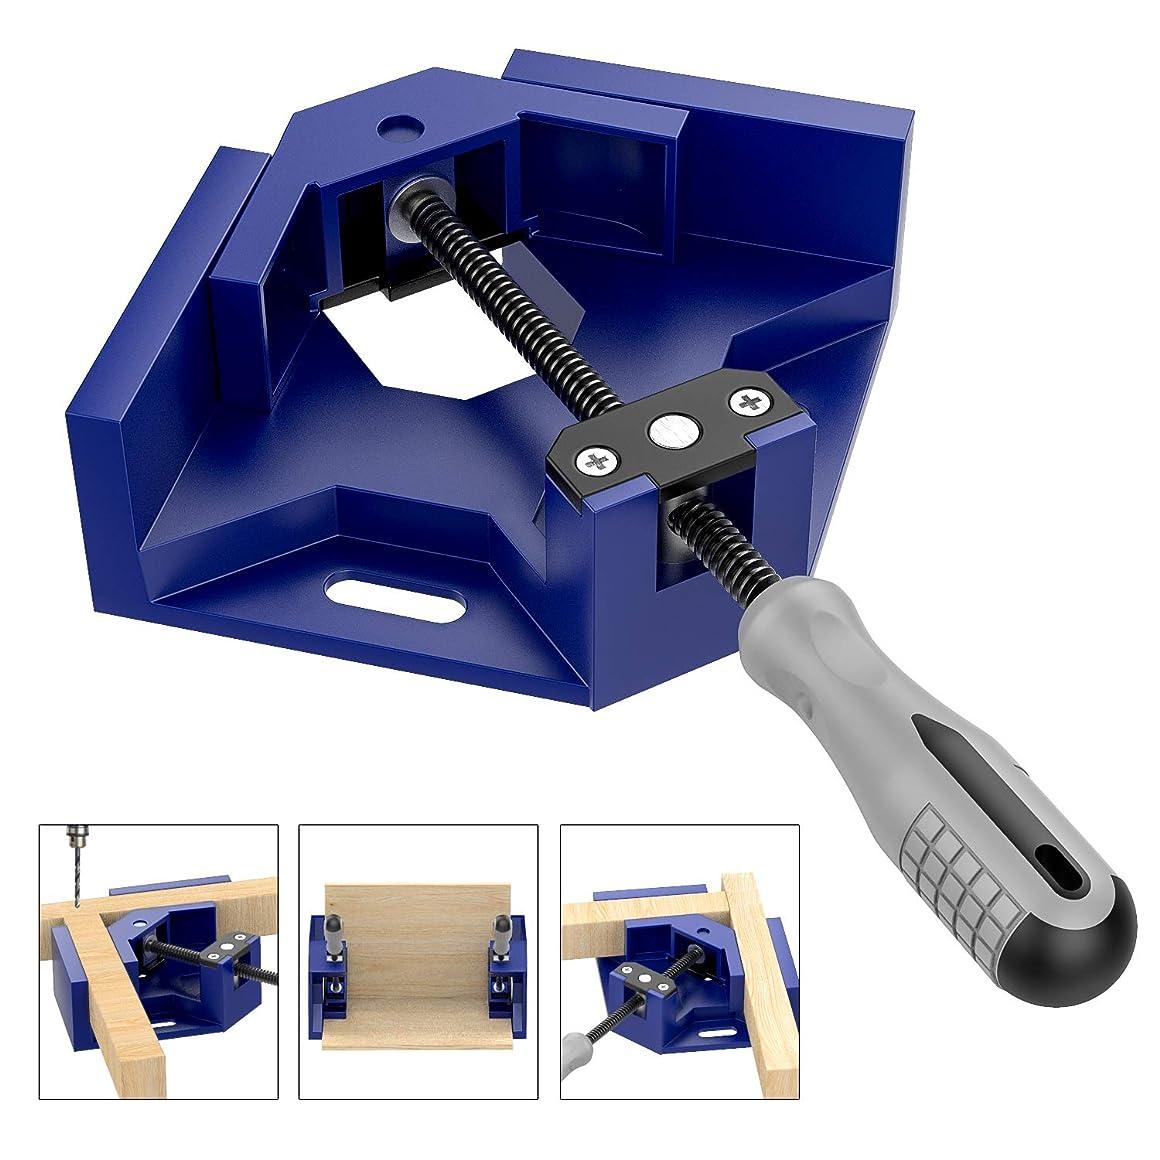 Housolution コーナークランプ 90度 木工用 溶接 直角固定 額縁 フレーム 固定板幅 70mm以下 - Blue…